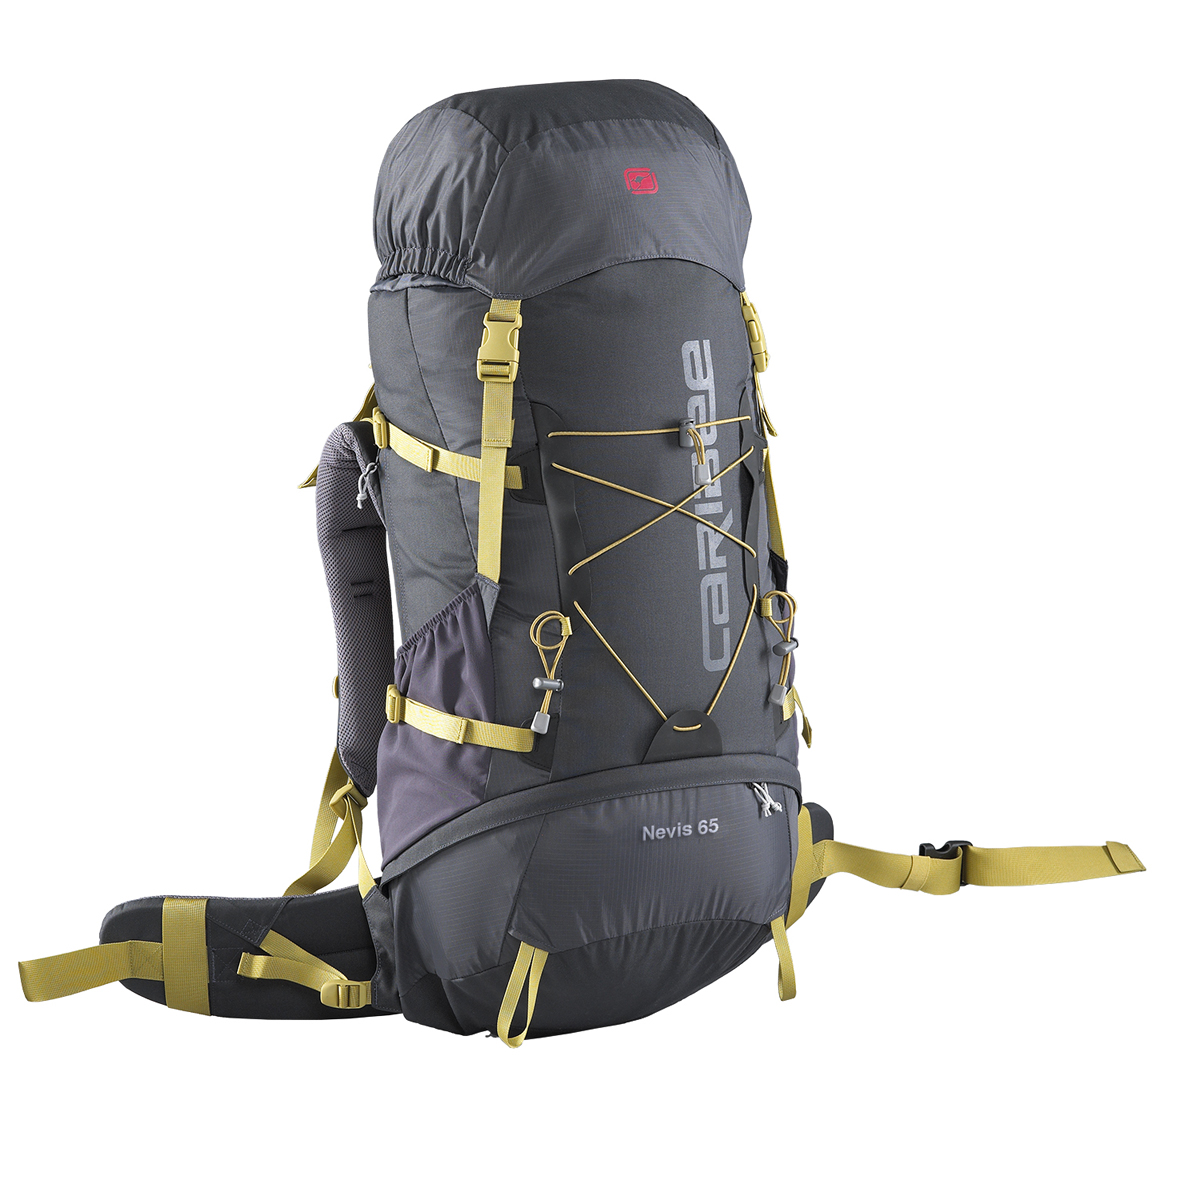 Рюкзак туристический Caribee Nevis, цвет: темно-серый, 65 л